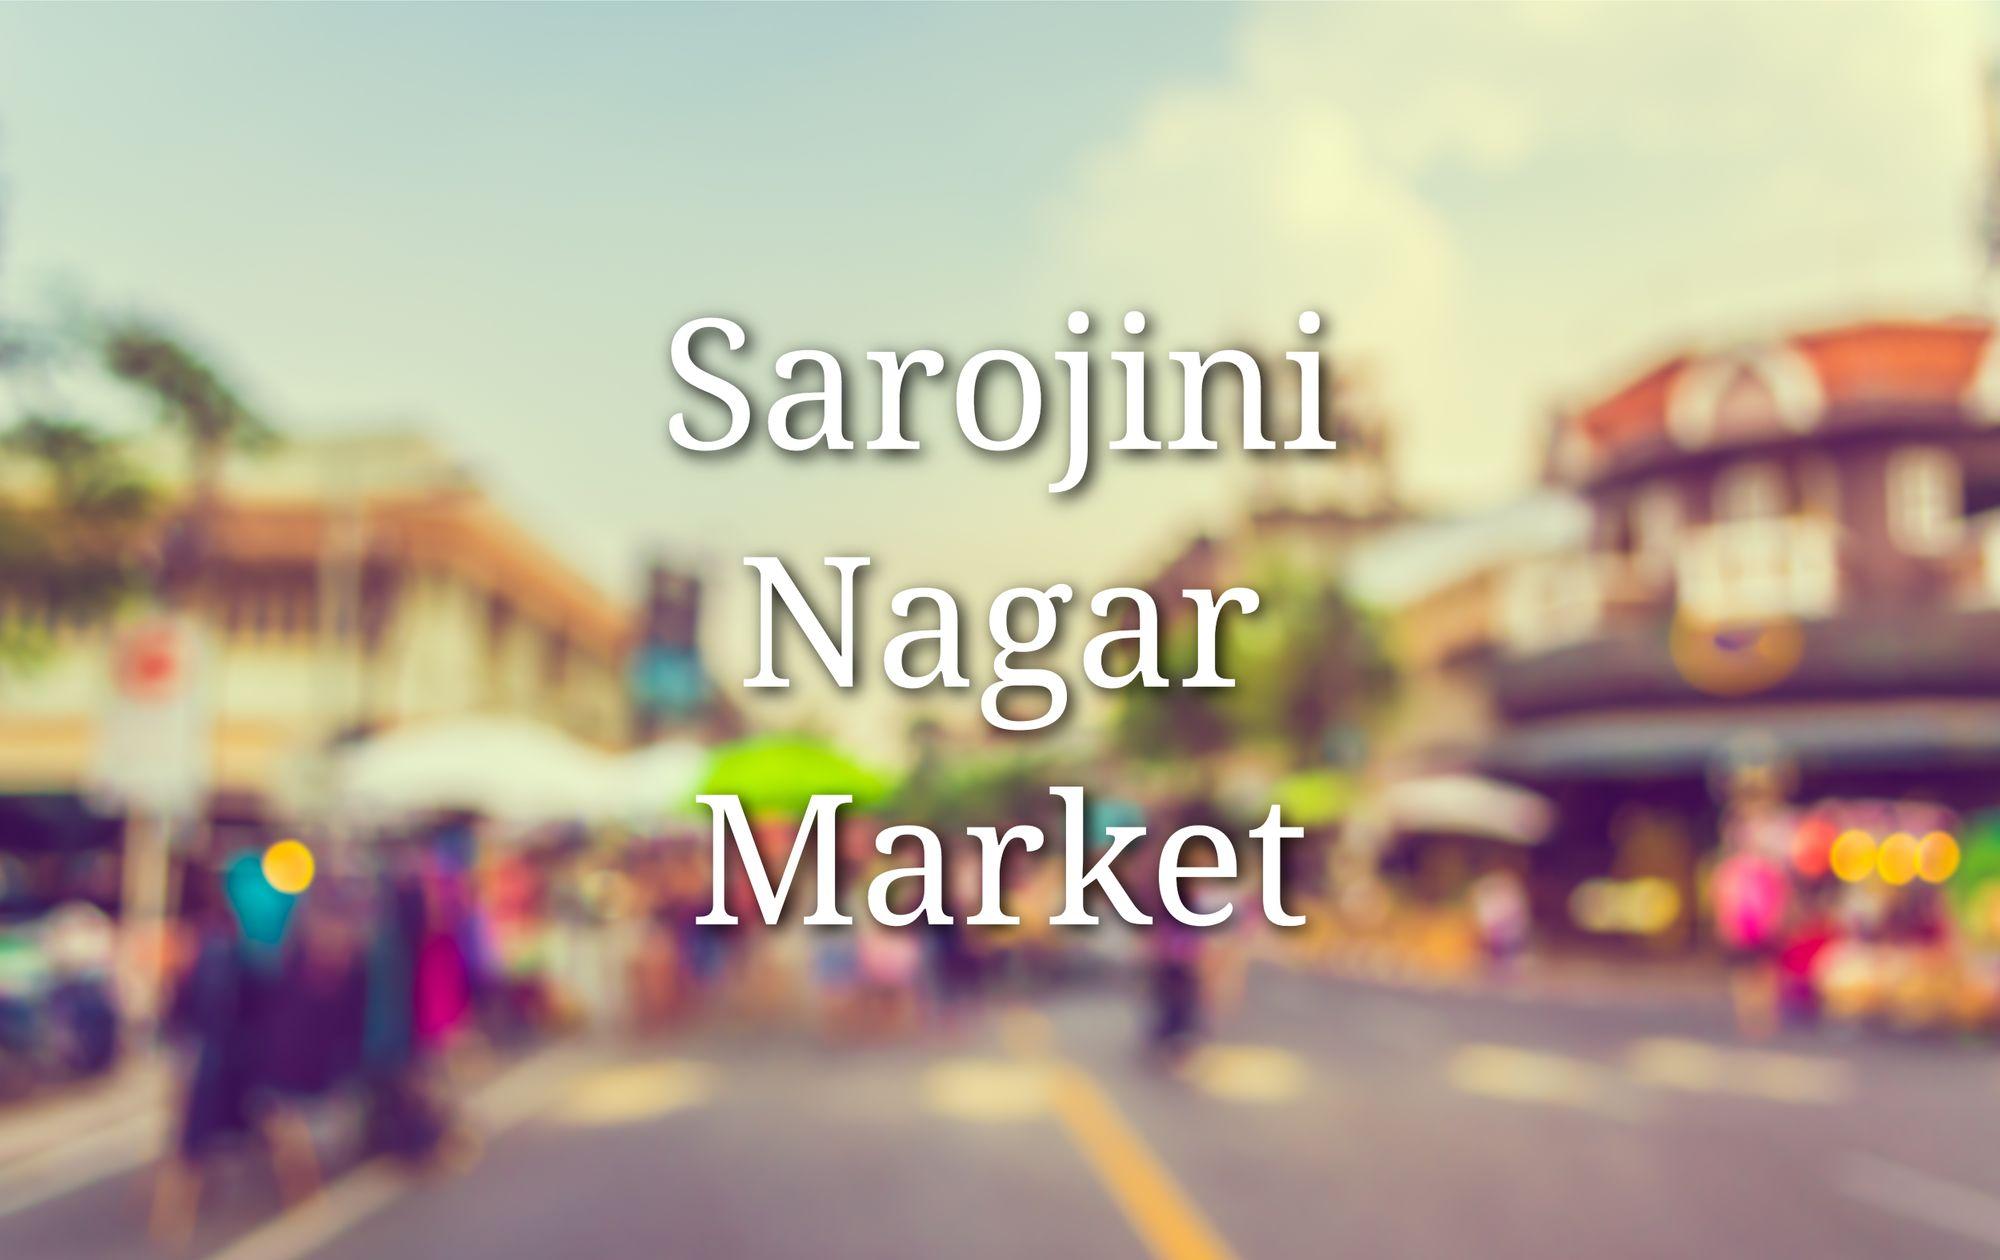 Sarojini Nagar Market: What Makes It a Shopping Paradise for Delhites?